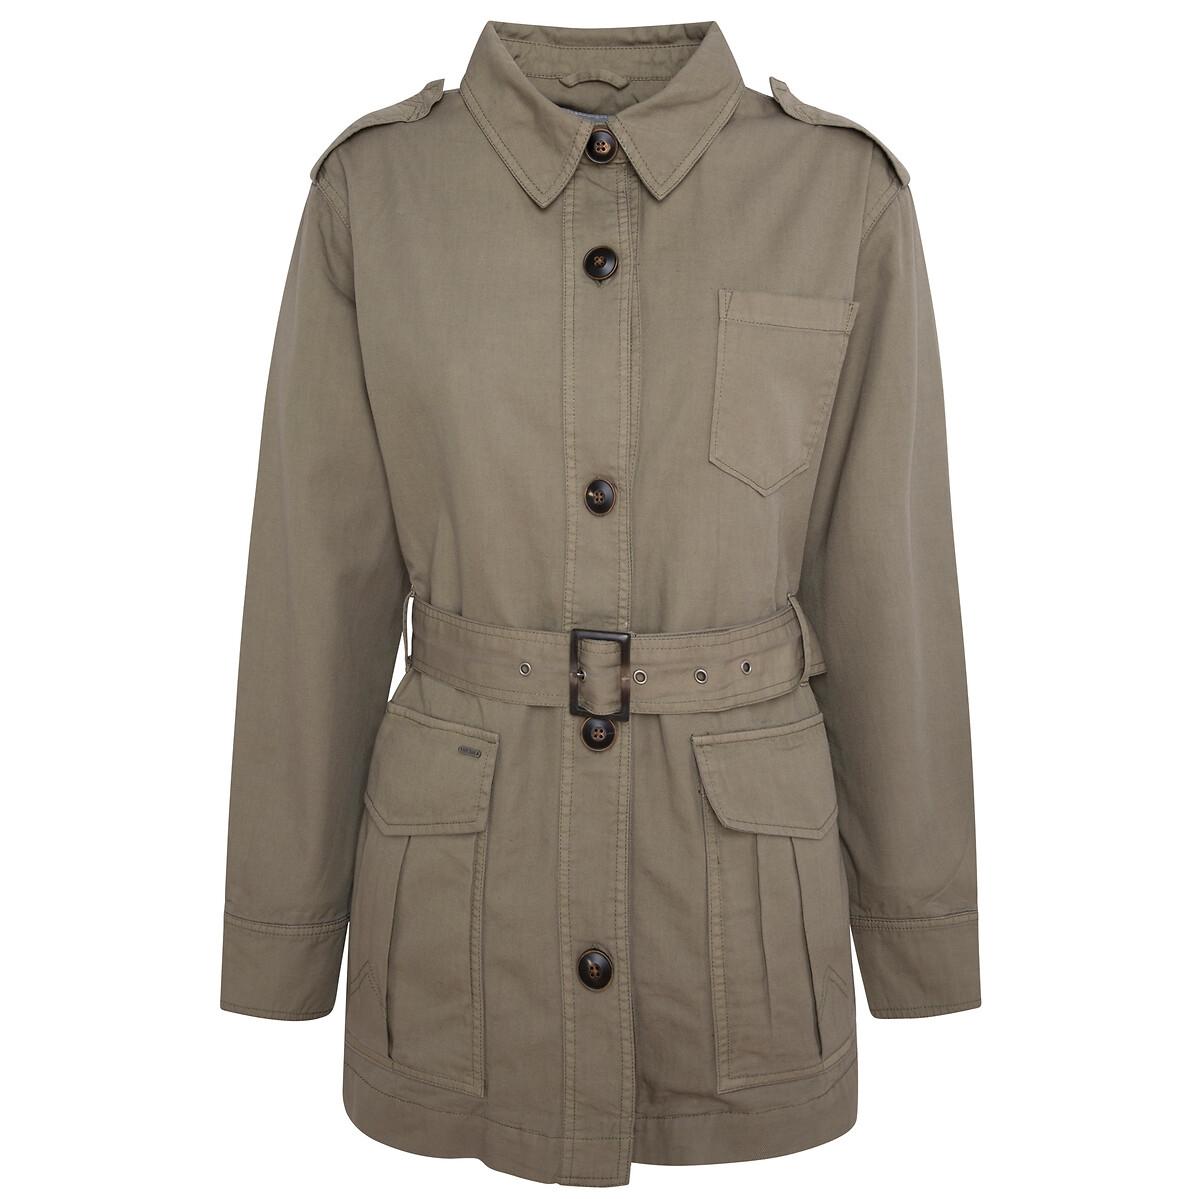 Куртка La Redoute В стиле милитари с воротником-стойкой M каштановый свитшот la redoute с логотипом в винтажном стиле la redoute m белый